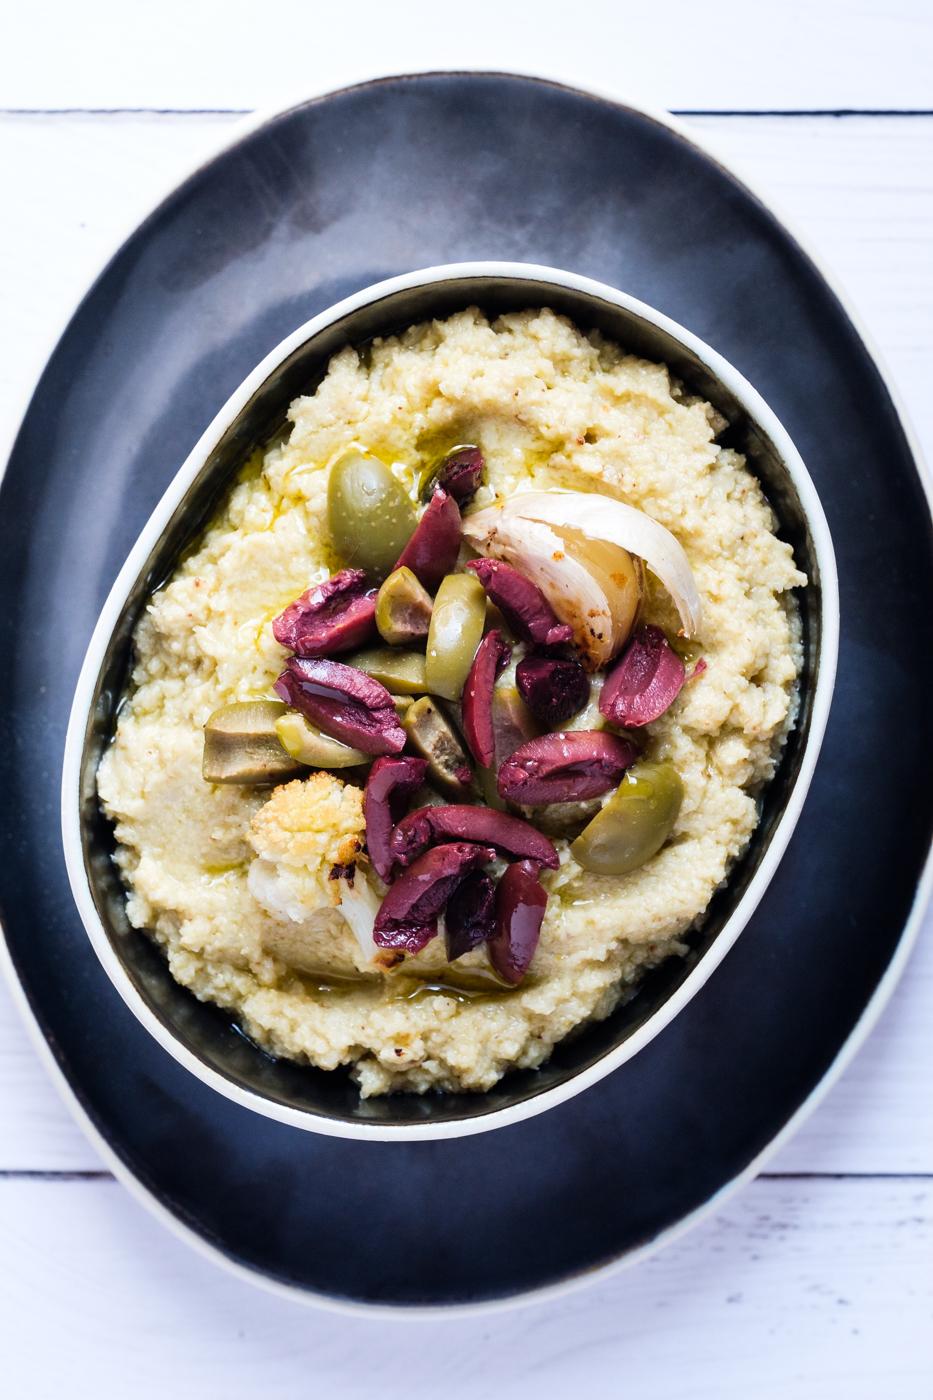 Cauliflower and Artichoke Hummus with Roasted Garlic